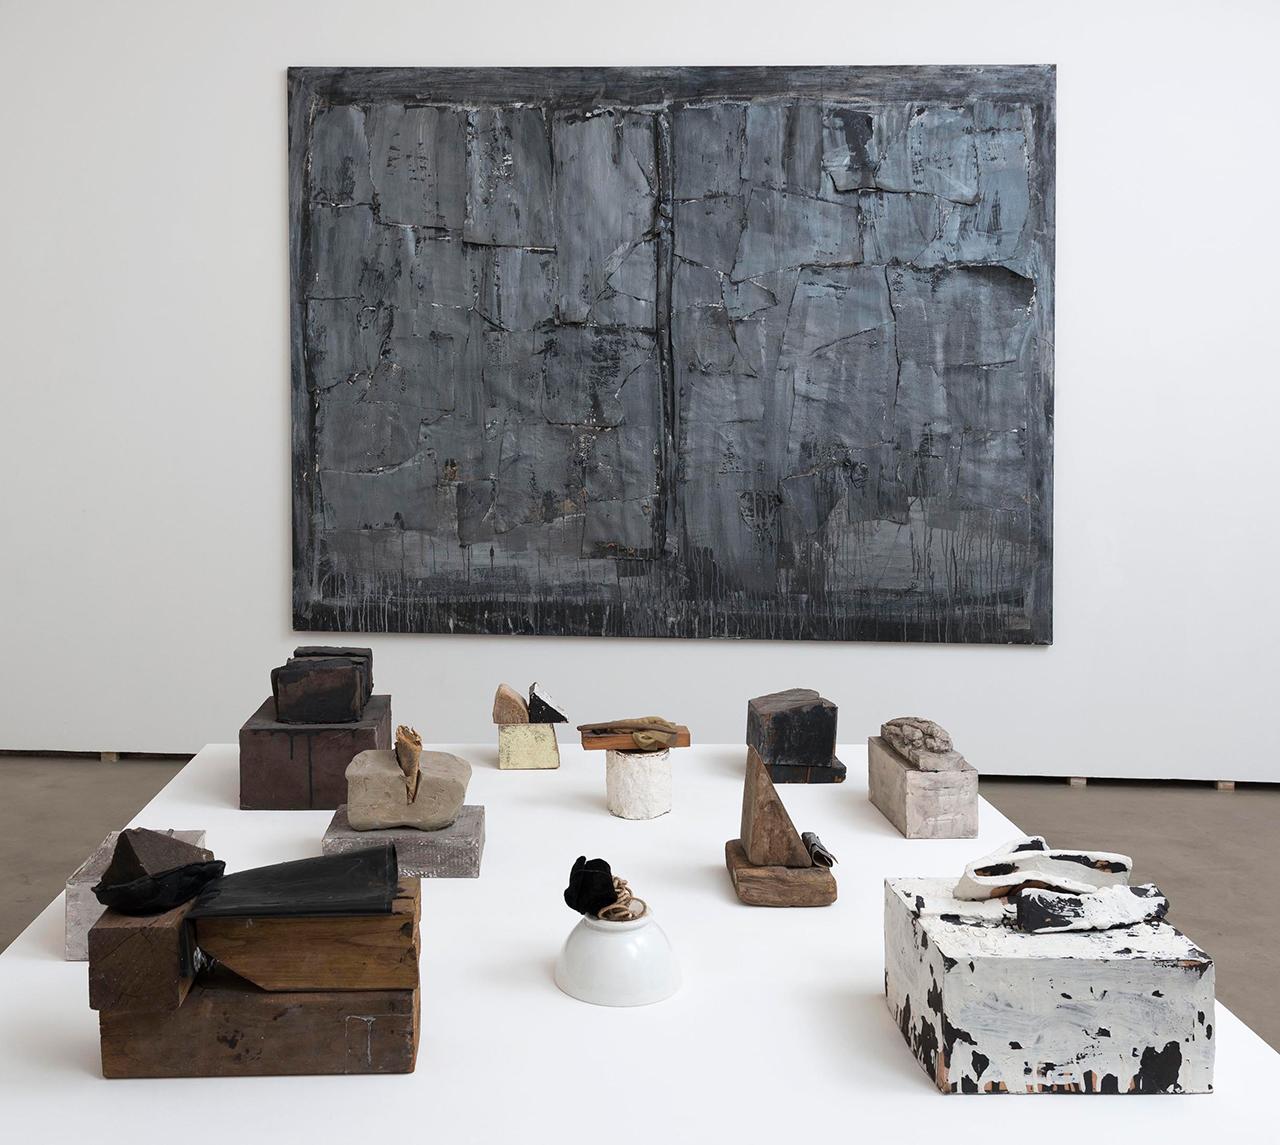 Installation view, 'Luisa Gardini   1965–2015' (2016) at Federica Schiavo Gallery (photo by Giorgio Benni, courtesy Federica Schiavo Gallery, Rome)